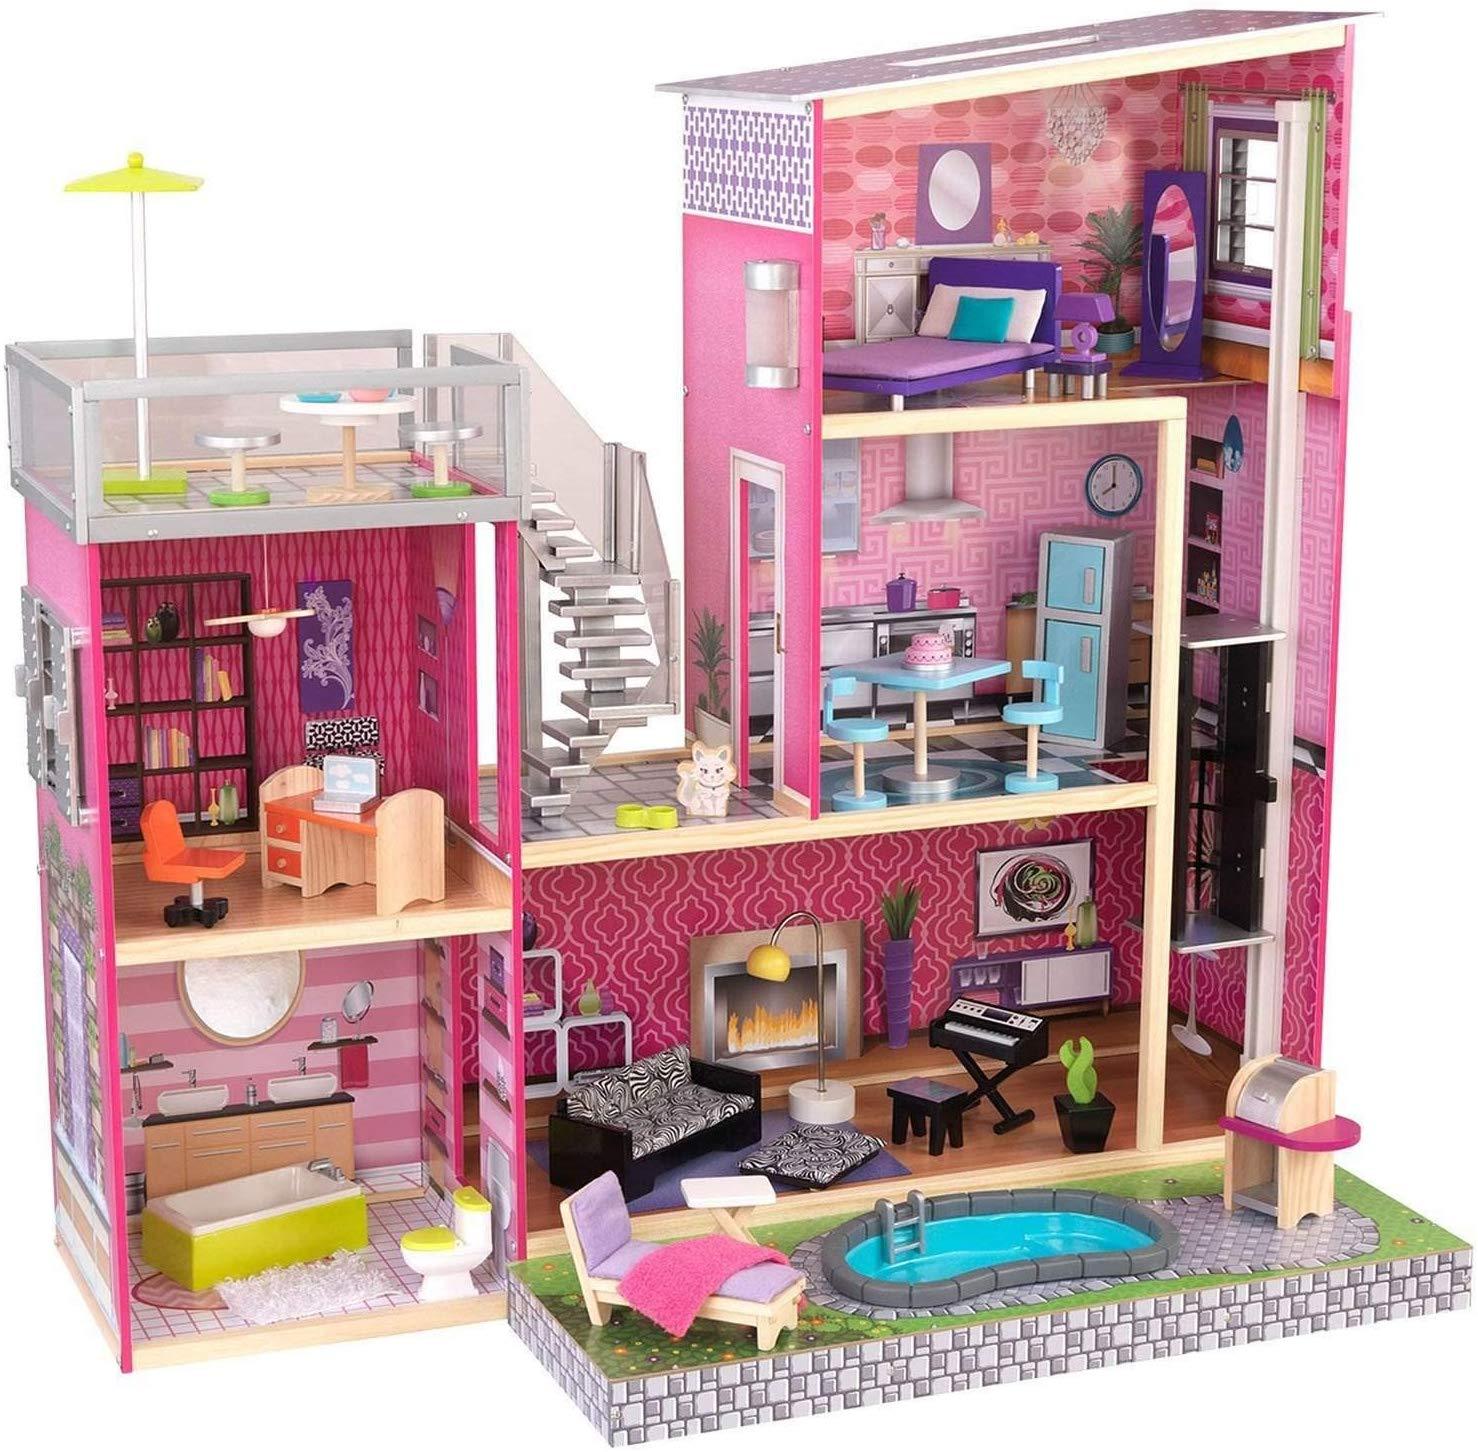 Kidkraft 65833 mansion dolls house at Amazon for £132.99